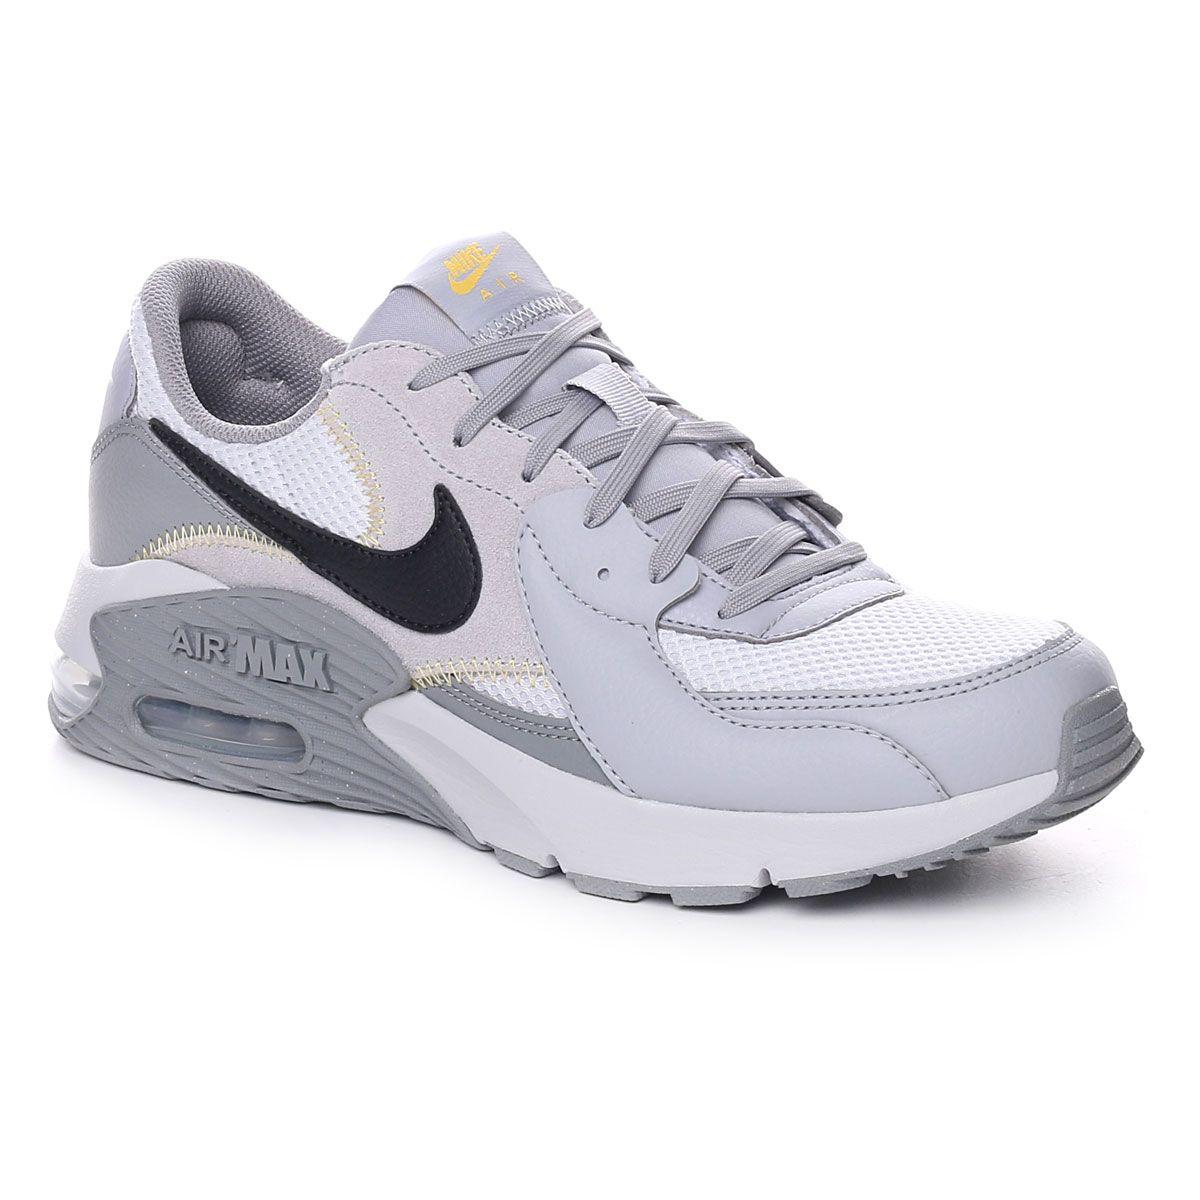 Nike Air Max Excee Uomo Platino Grigio